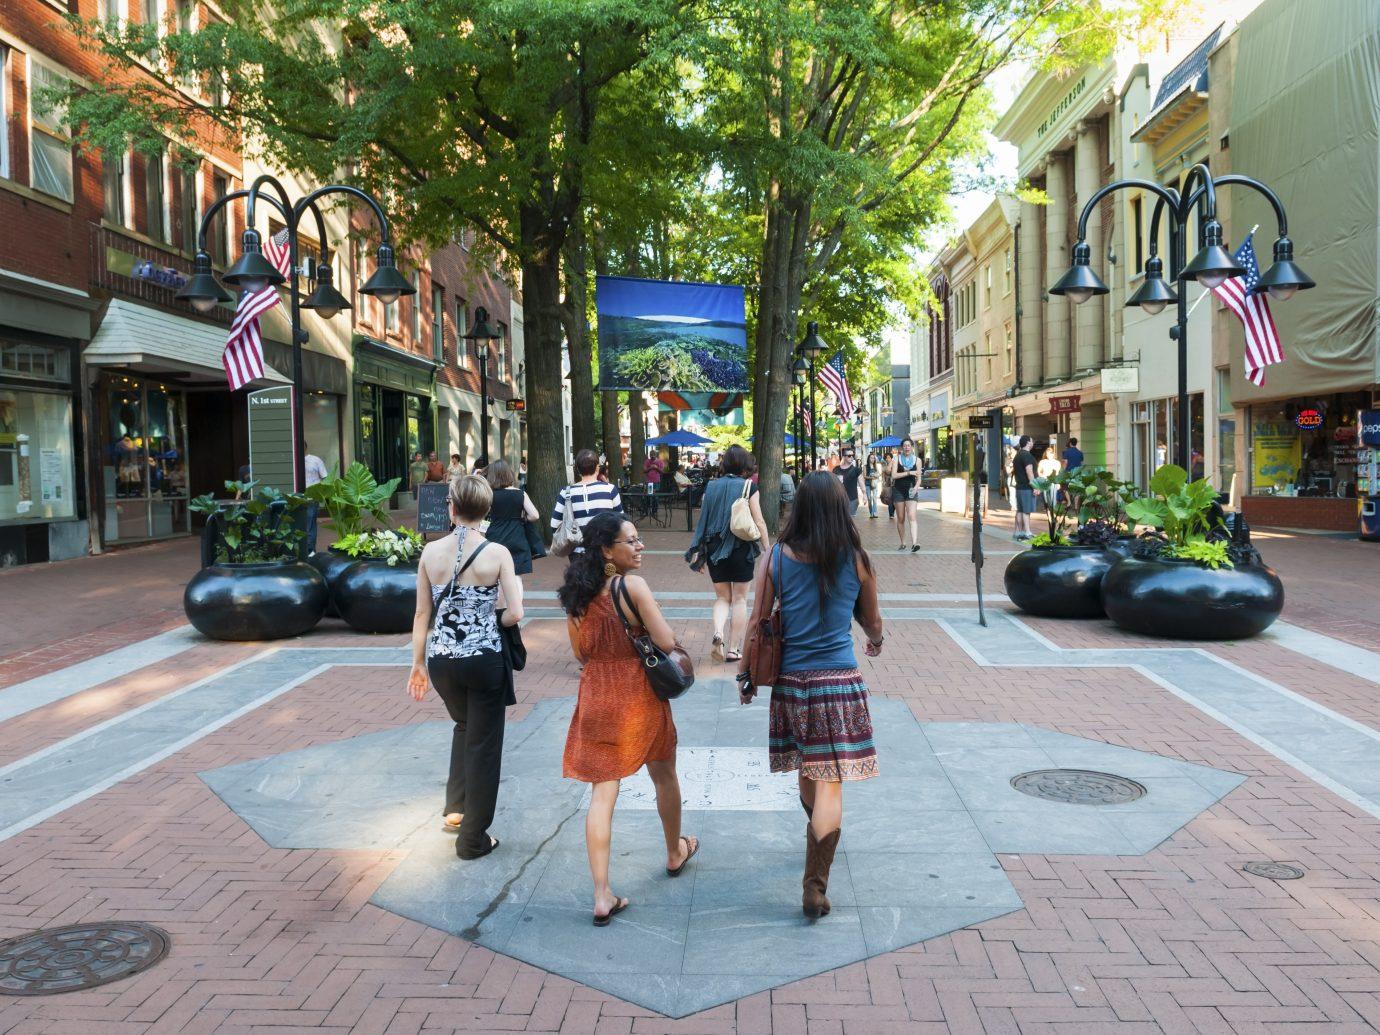 Charlottesville, Virginia, USA - June 7, 2012: Pedestrians enjoy a beautiful summer afternoon in downtown Charlottesville.